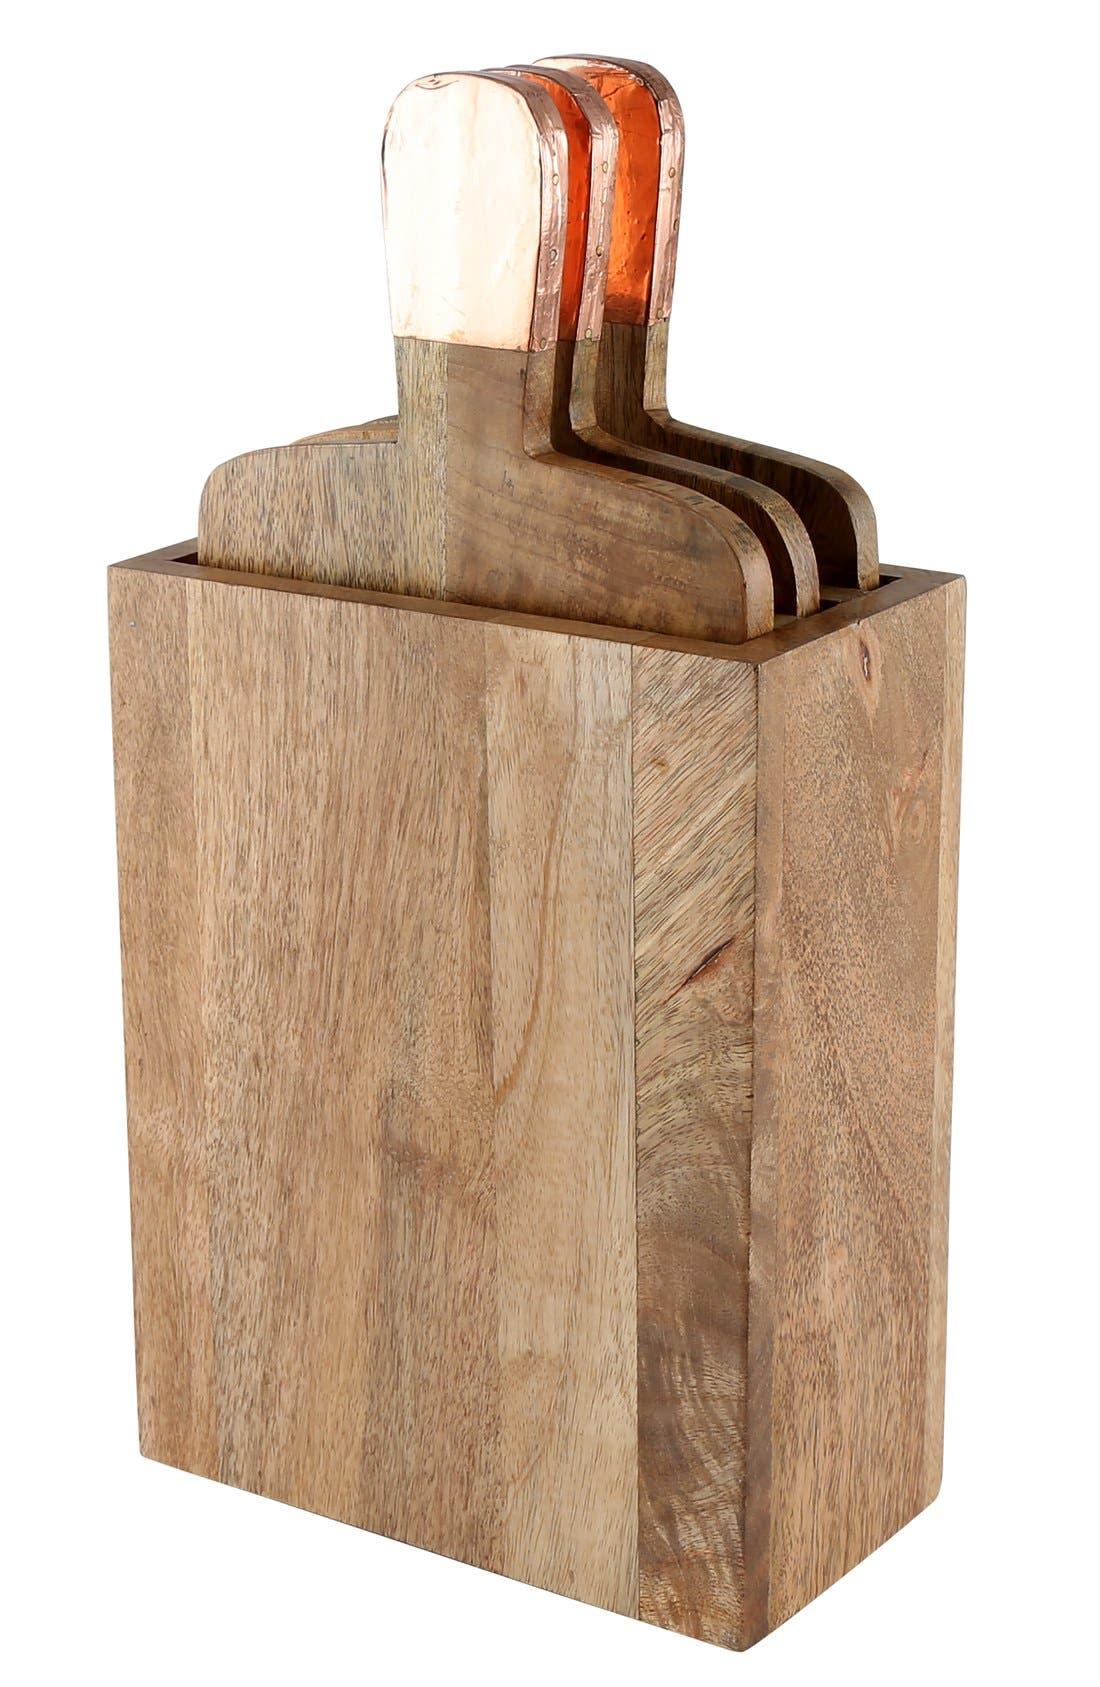 Main Image - Thirstystone 'Urban Farm' Mango Wood Serving Boards & Holder